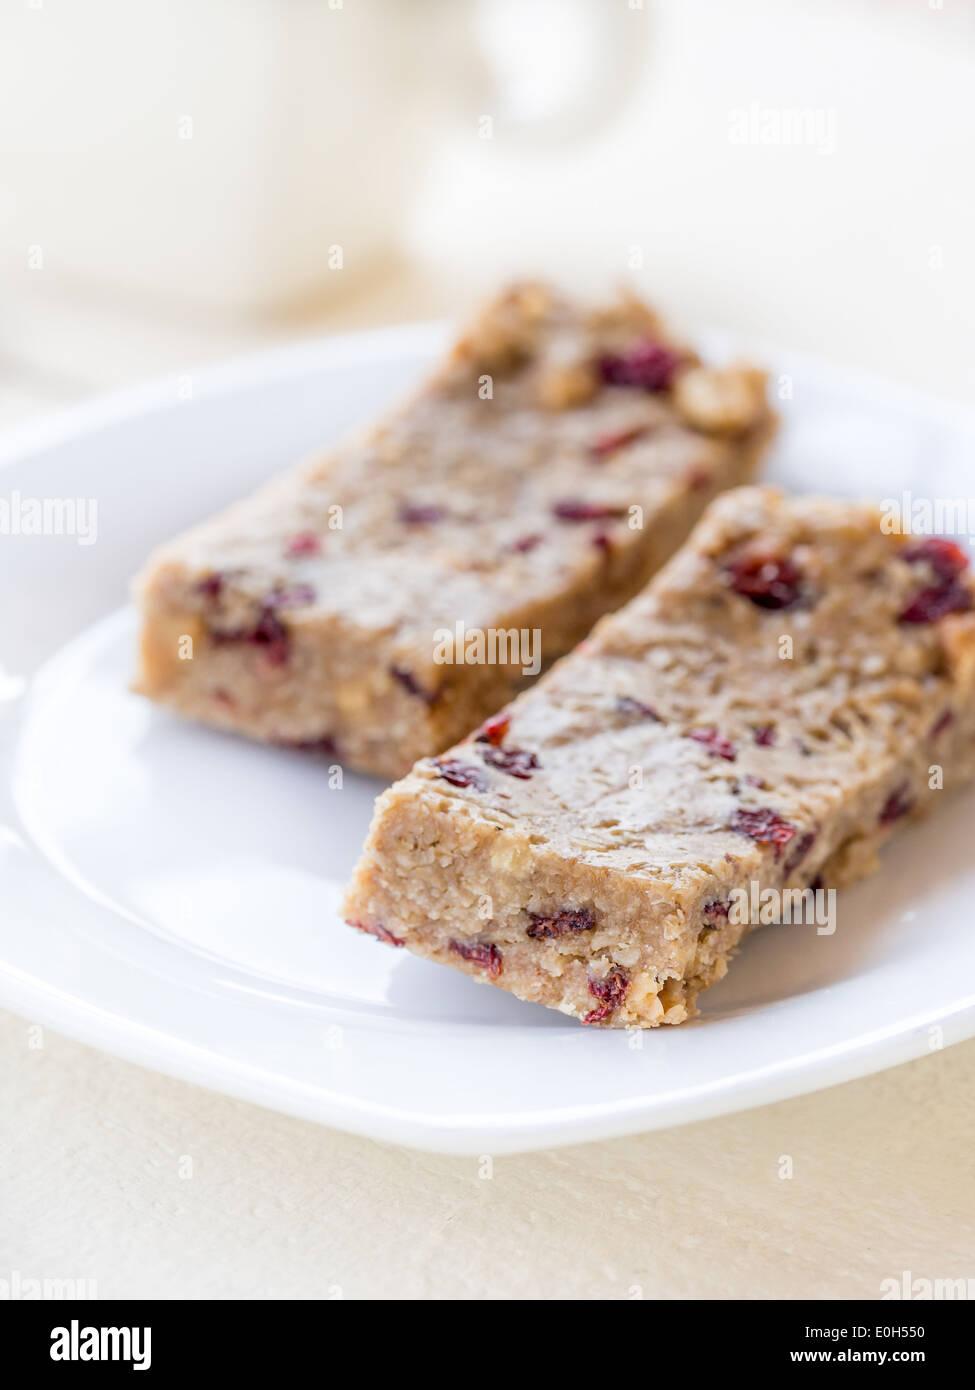 Homemade protein bars oats honey peanut butter